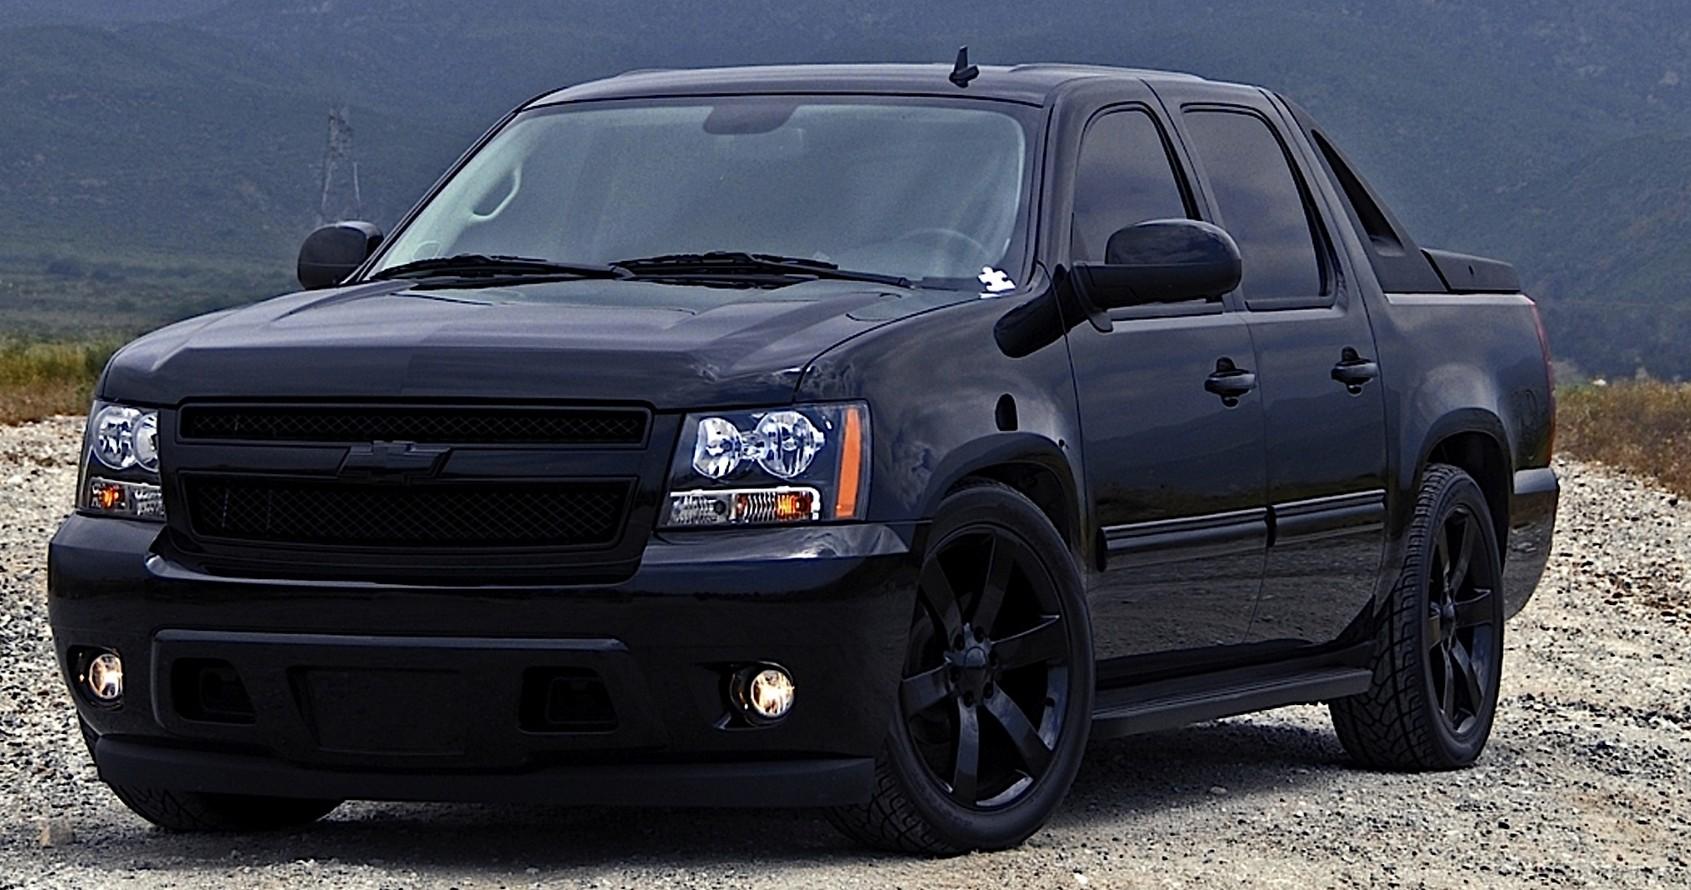 Chevrolet clipart custom & Suggestions avalanche Keywords custom